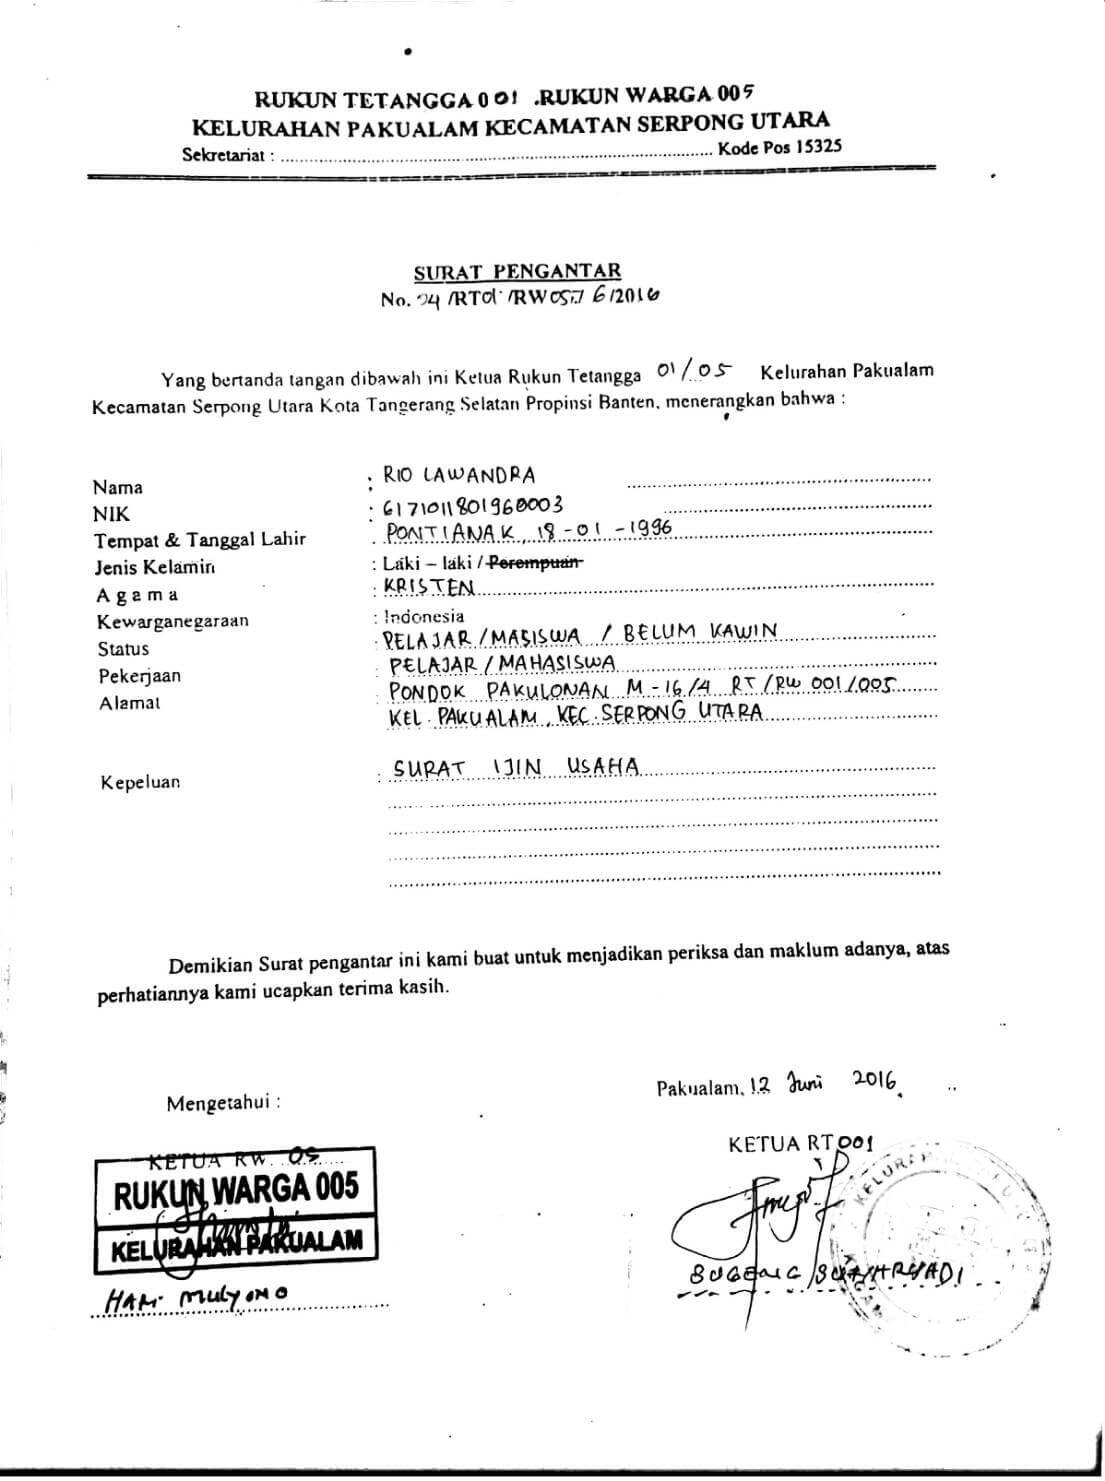 contoh surat pengantar rt/rw